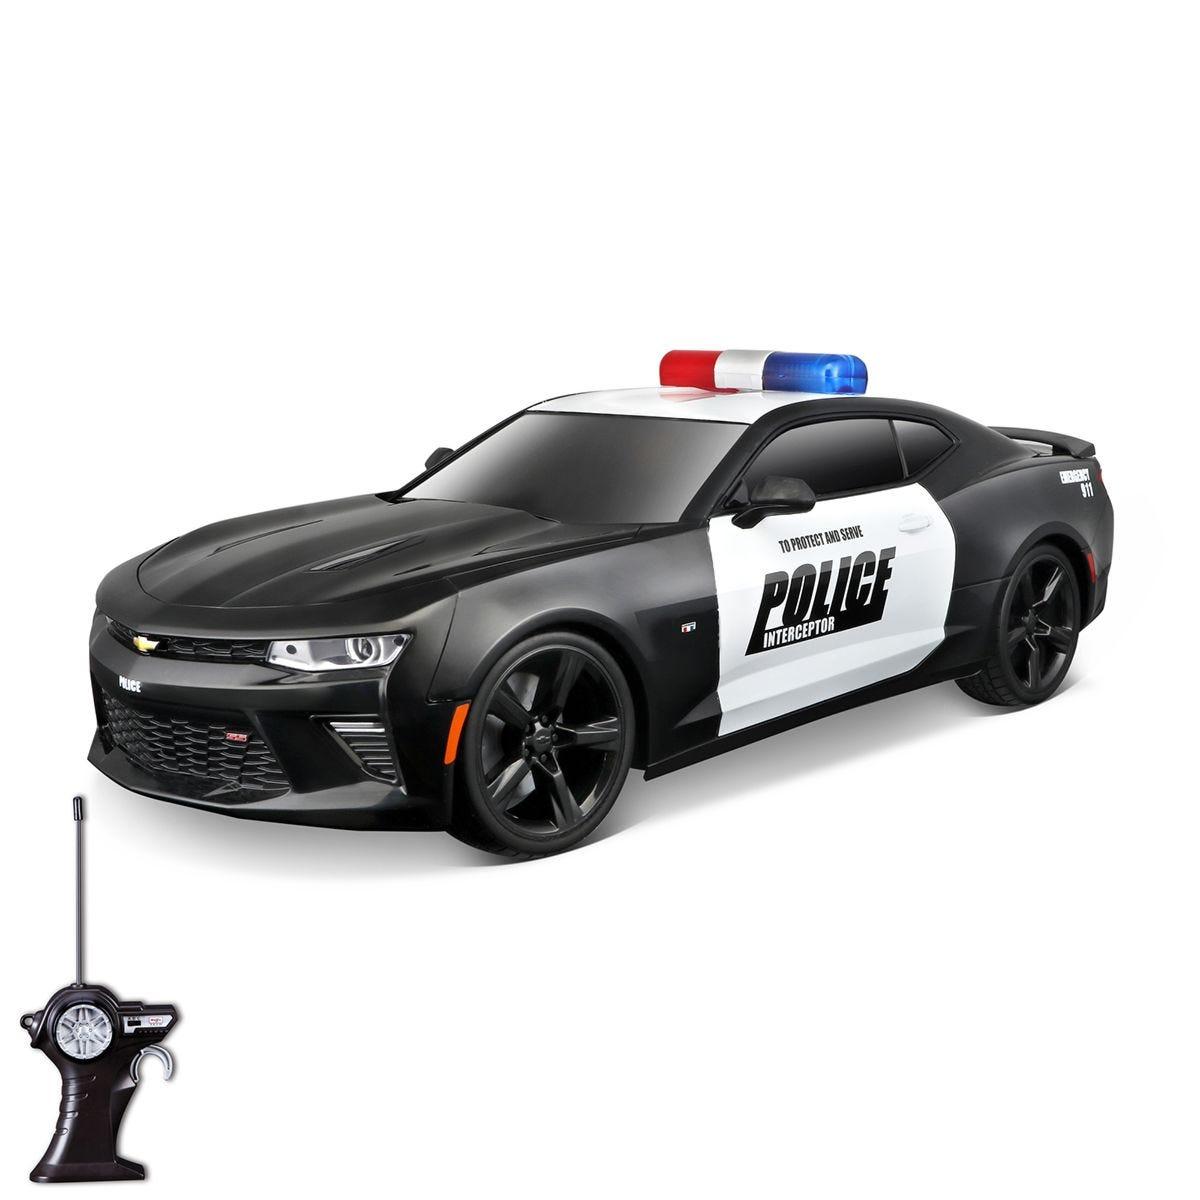 Maisto 1:14 RC Police Car